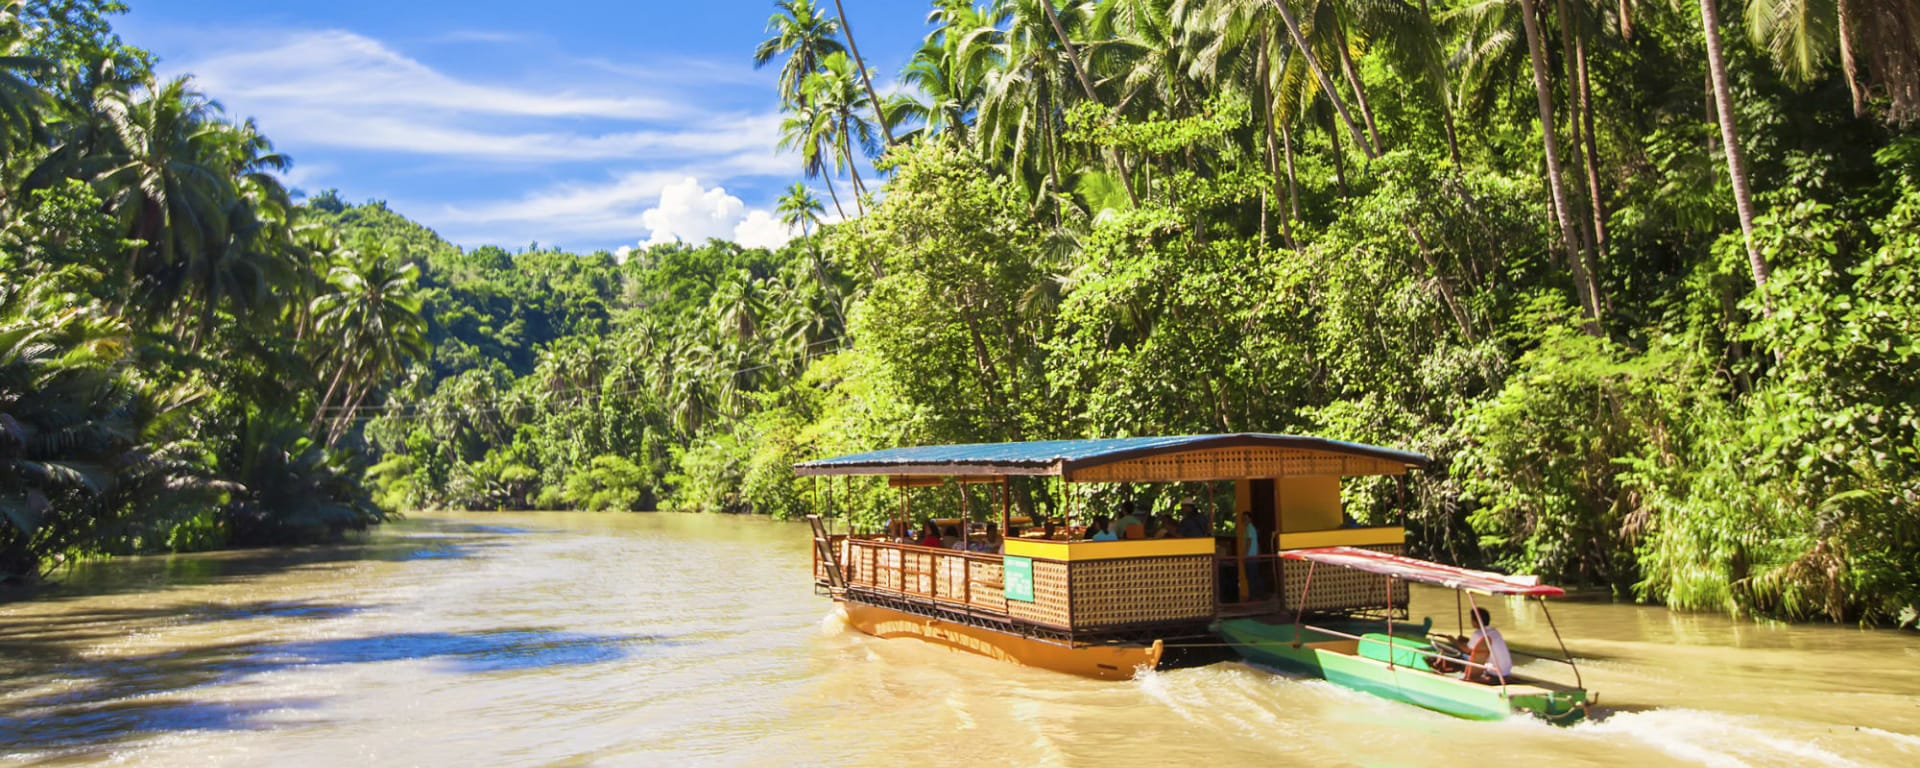 Faszination Bohol, EN, Ganztägig: Philippinen Bohol Loboc River